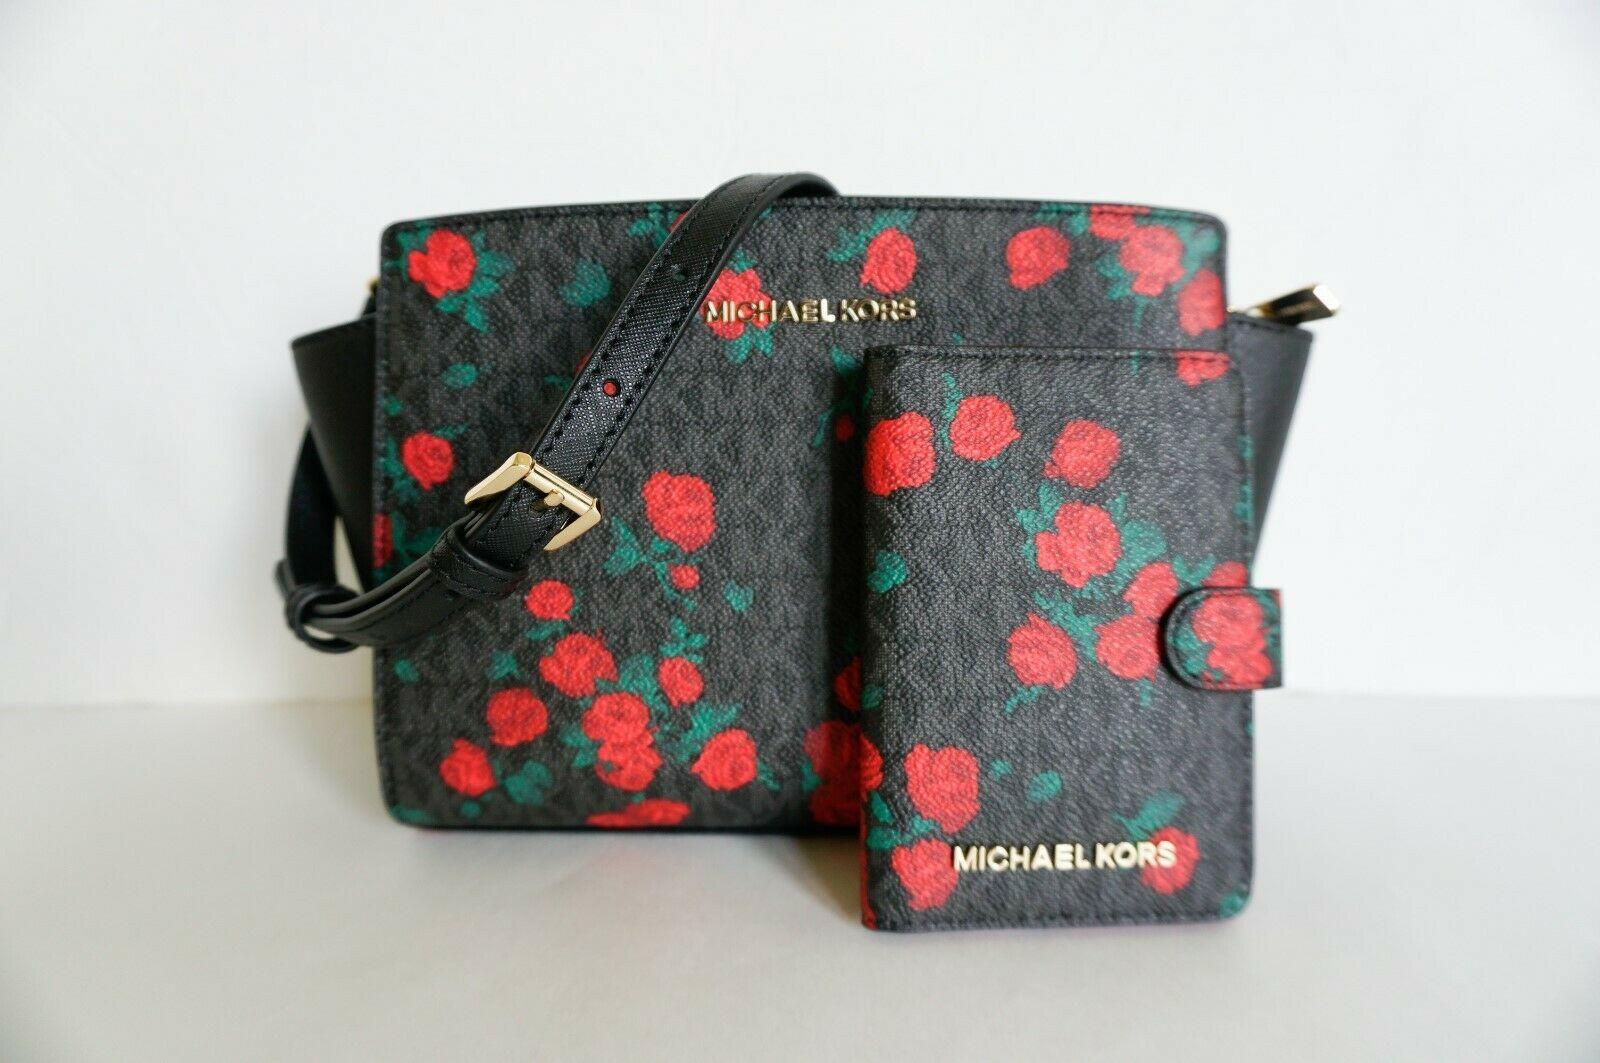 dc5e945b85ea Nwt Michael Kors Selma Md Messenger Bag & and 38 similar items. 57